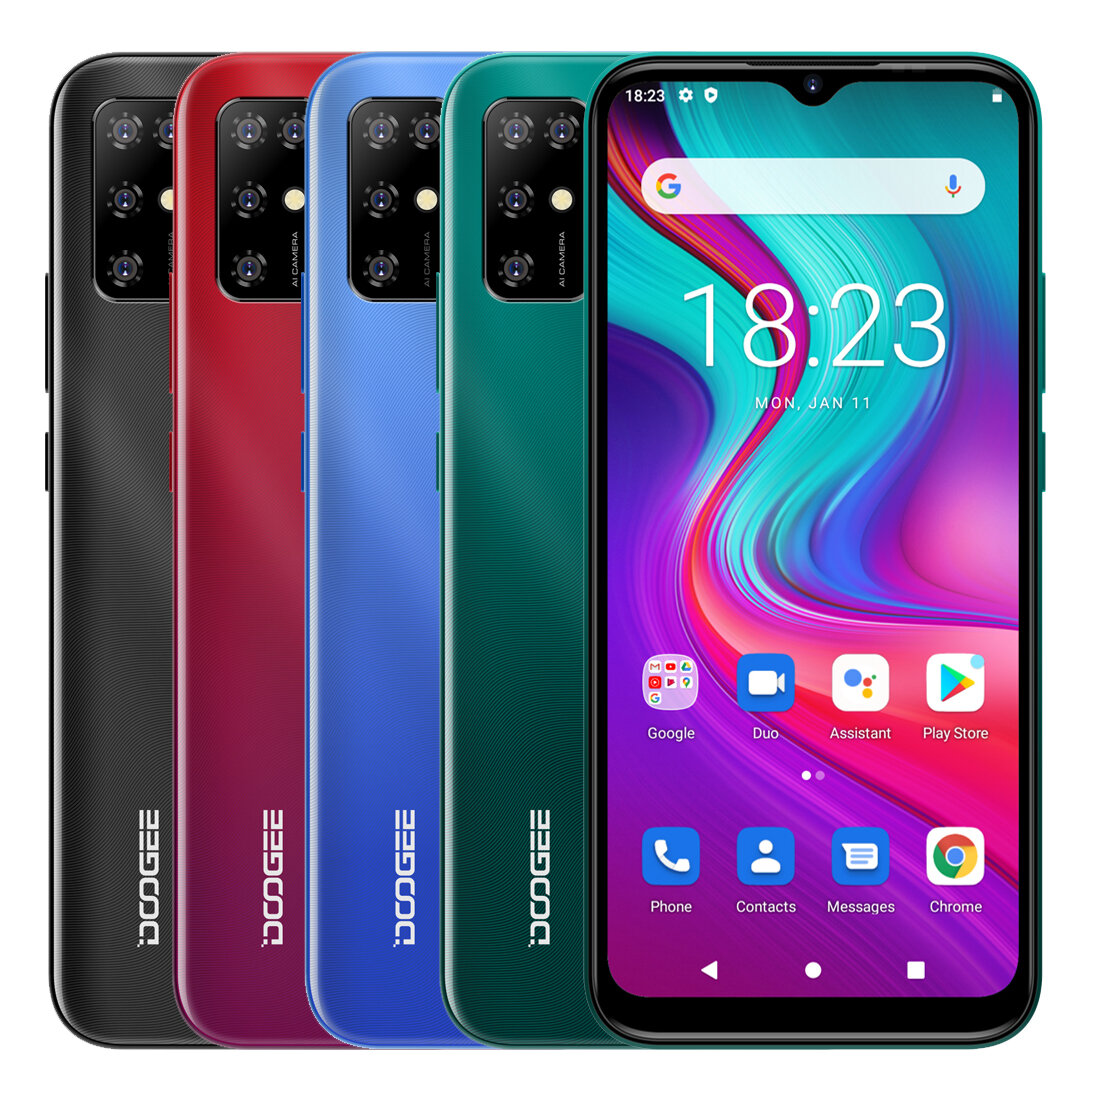 DOOGEE X96 Pro Global Version 6.52 inch HD+ Waterdrop Screen 4GB 64GB 5400mAh Android 11.0 SC9863A 13MP AI Quad Camera Octa Core 4G Smartphone